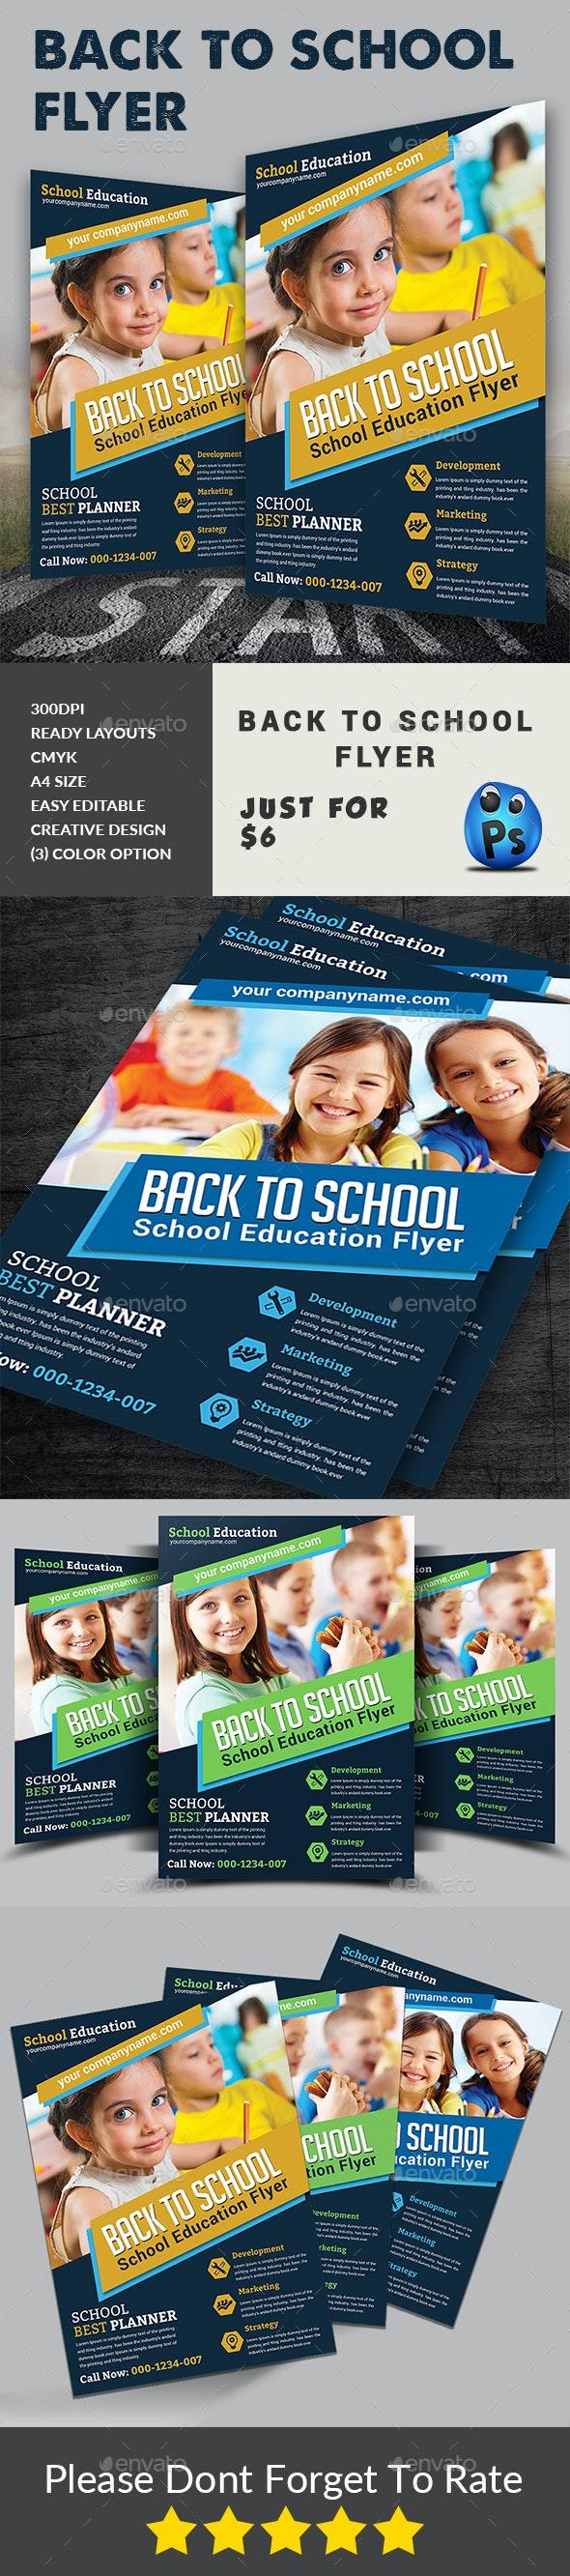 Back to School Flyer - Corporate Flyers